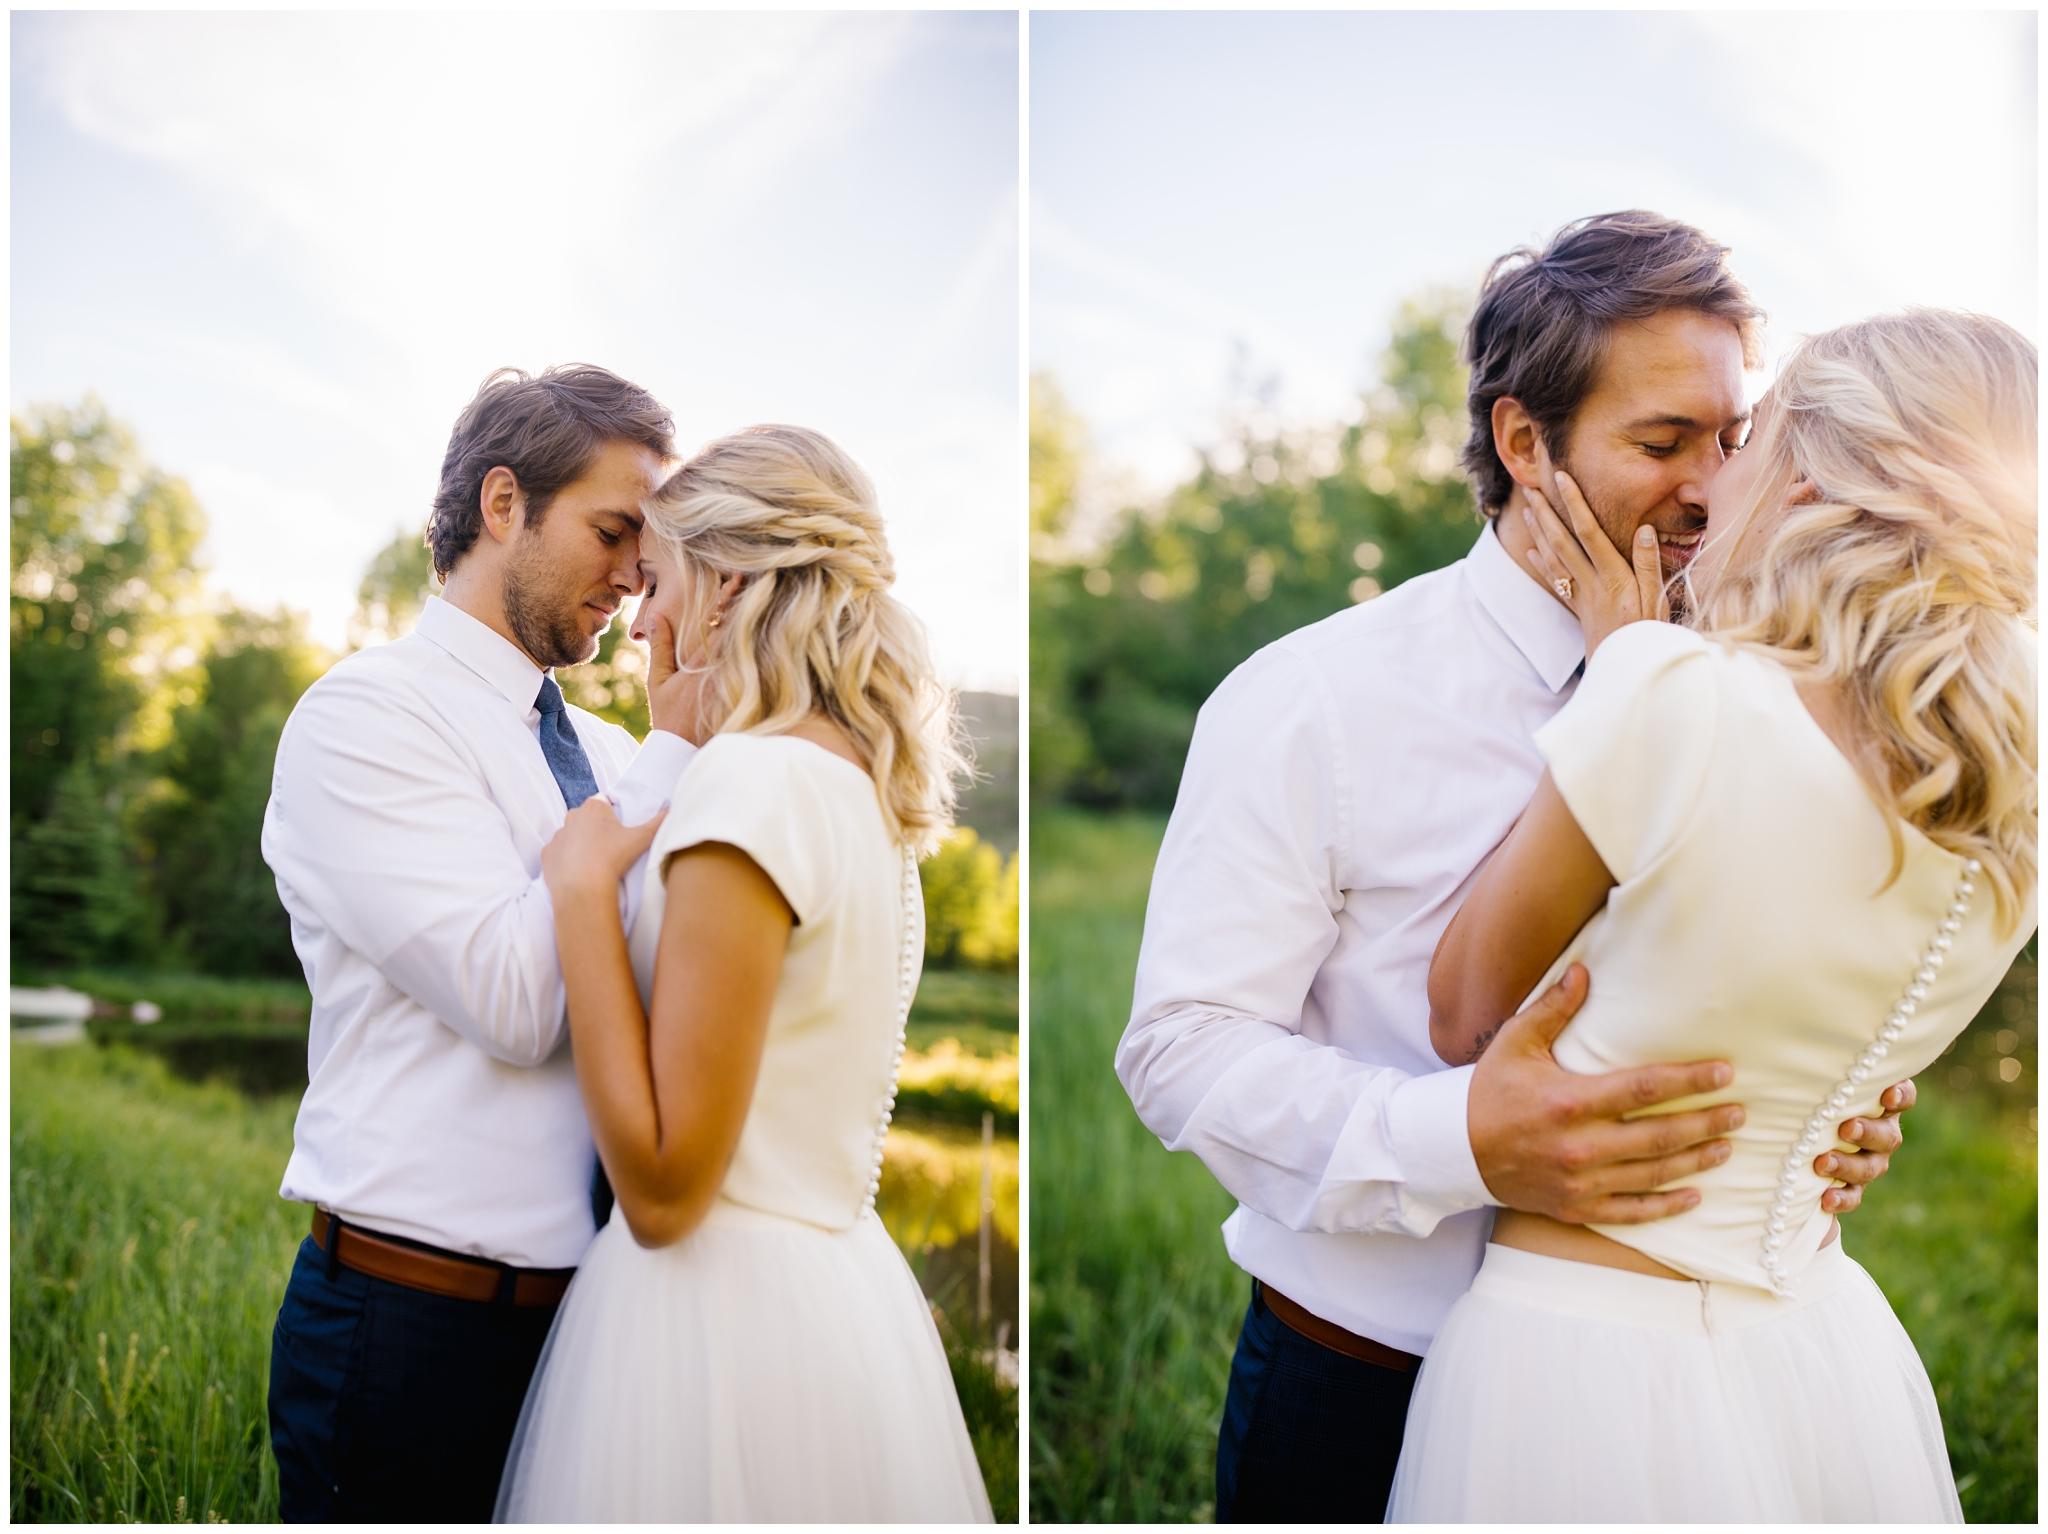 Lizzie-B-Imagery-Utah-Wedding-Photographer-Park-City-Photographer_0042.jpg